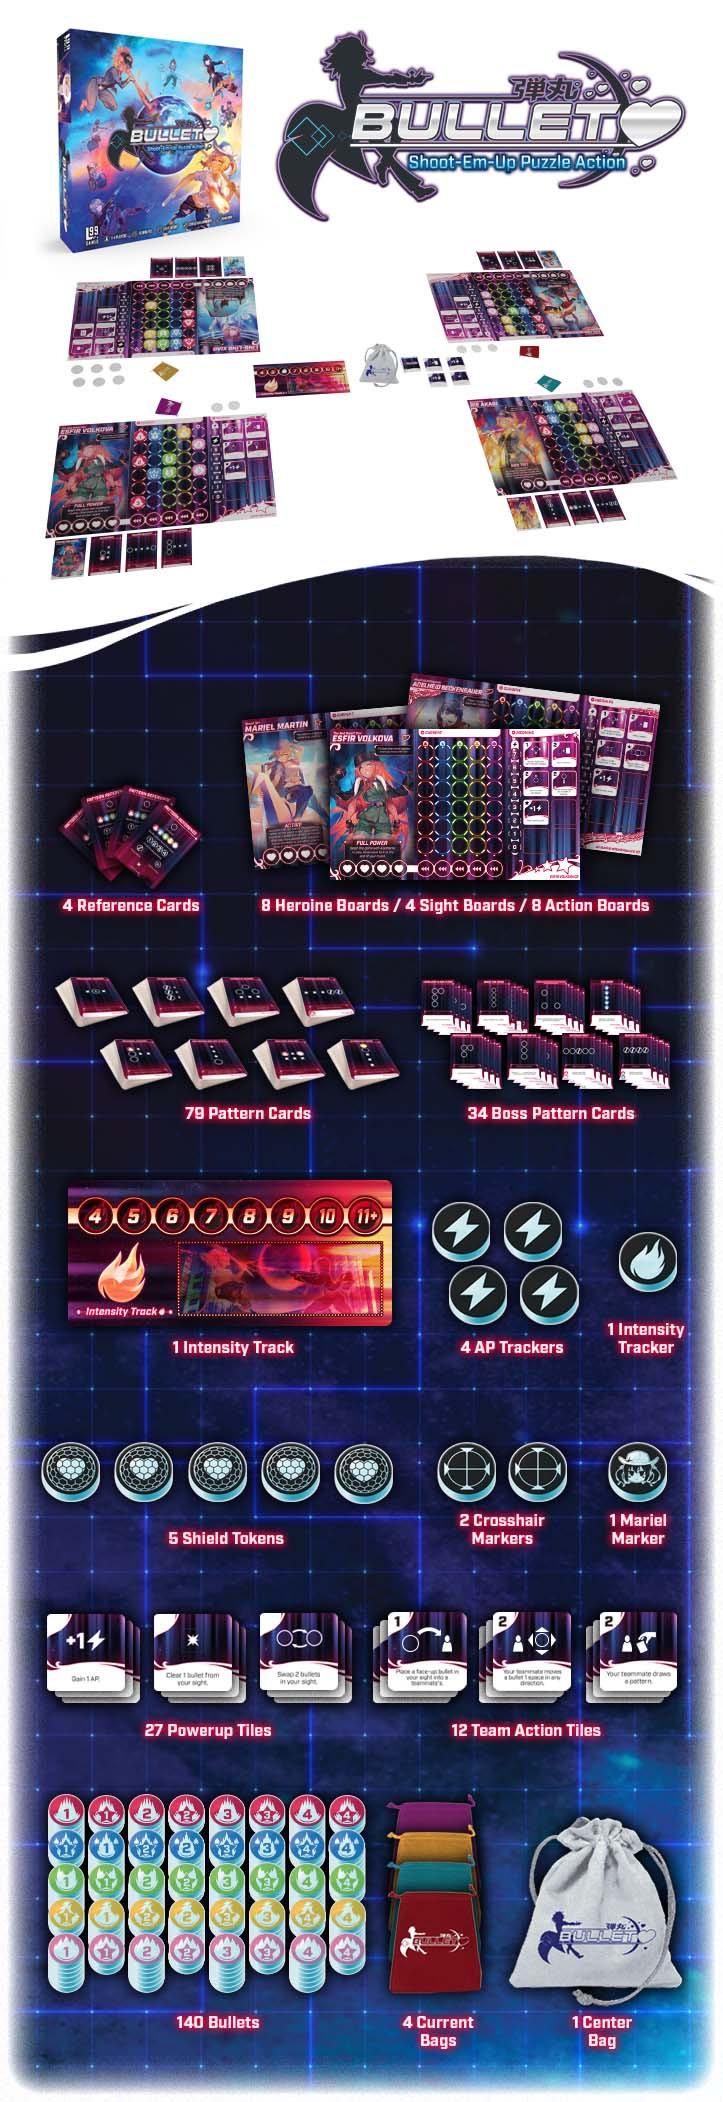 Bullet_Kickstarter_Level_99_Games_Whats_